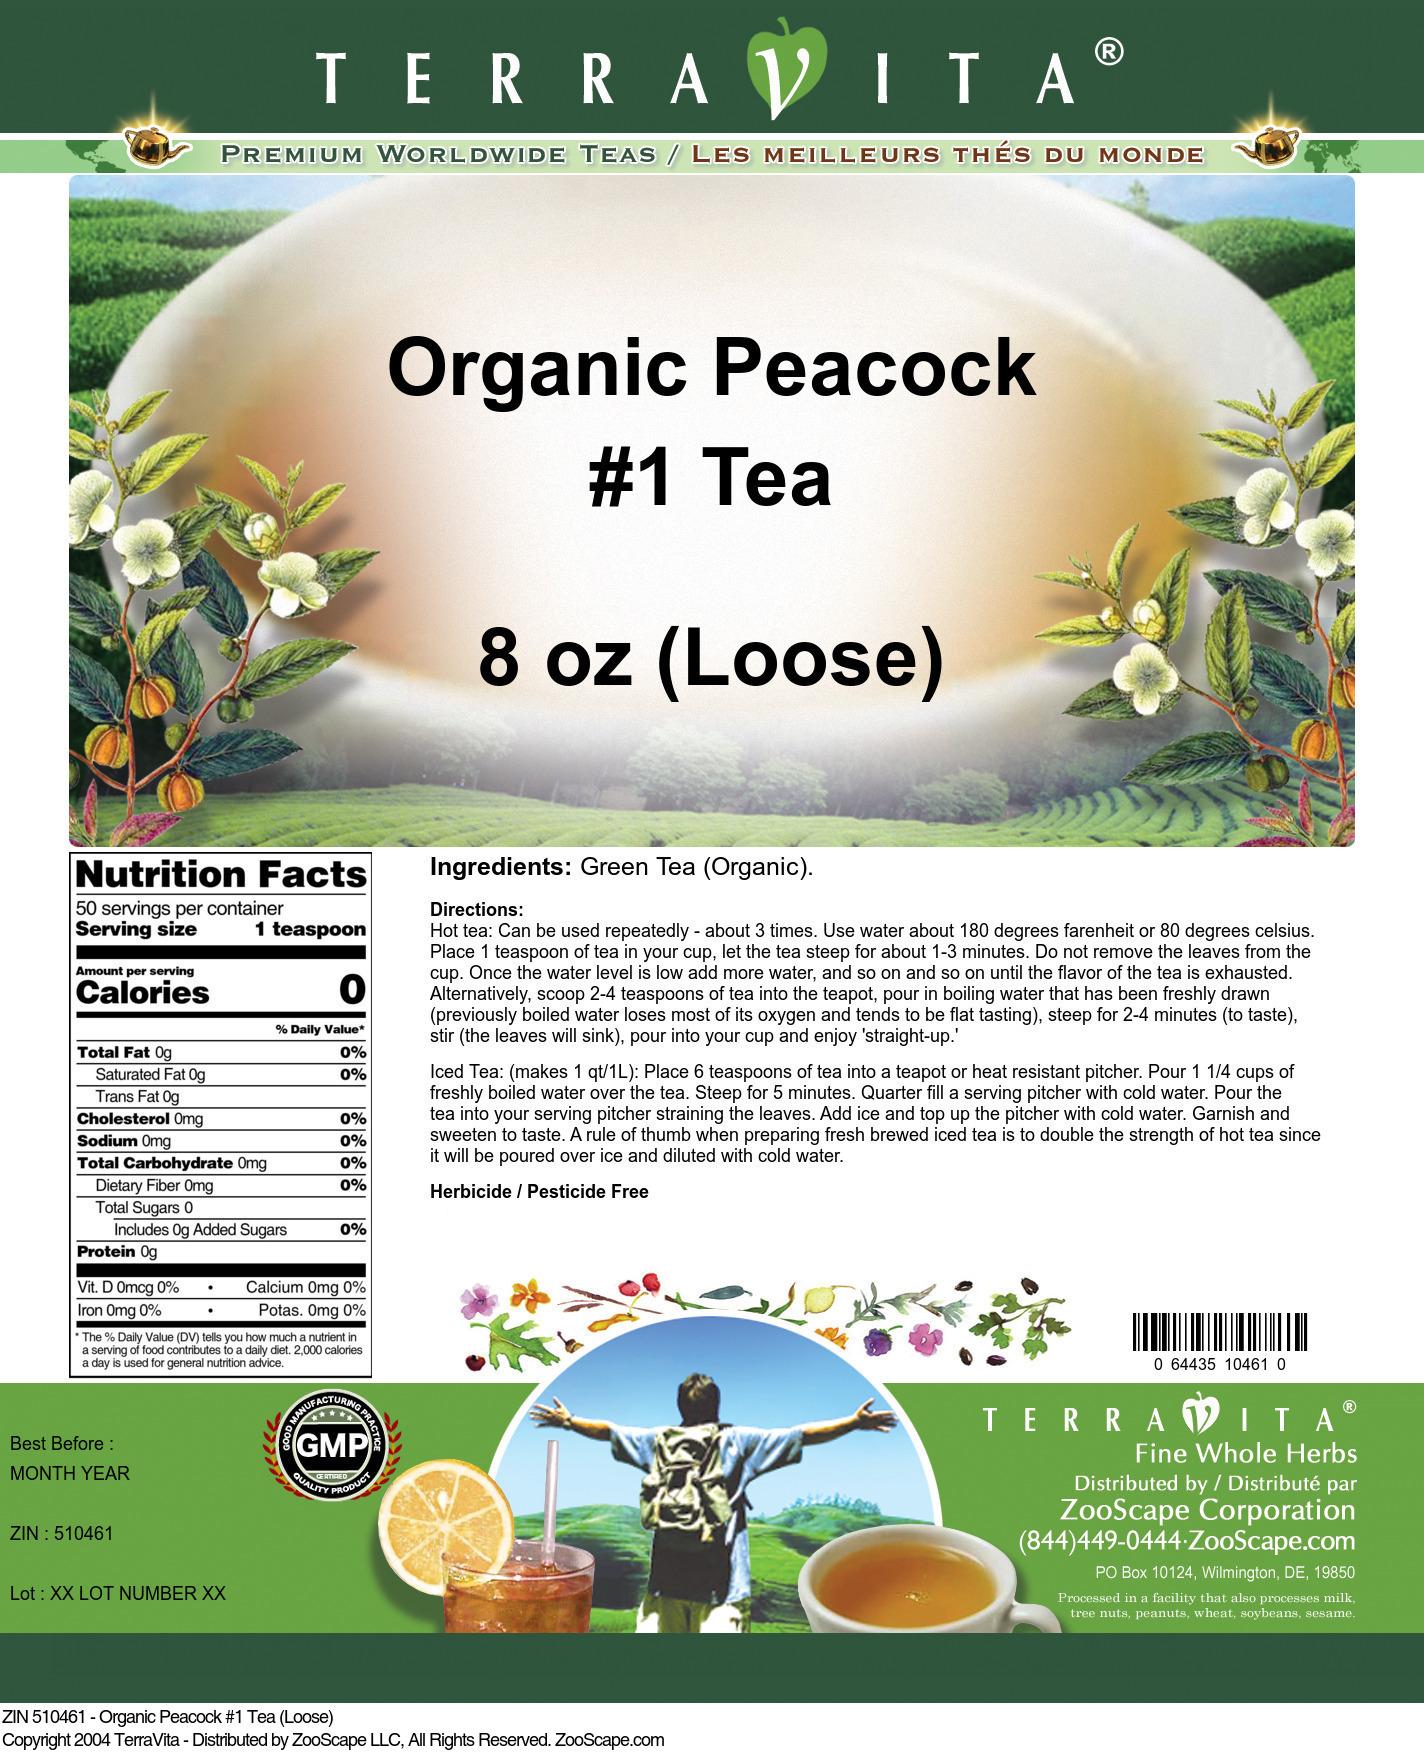 Organic Peacock #1